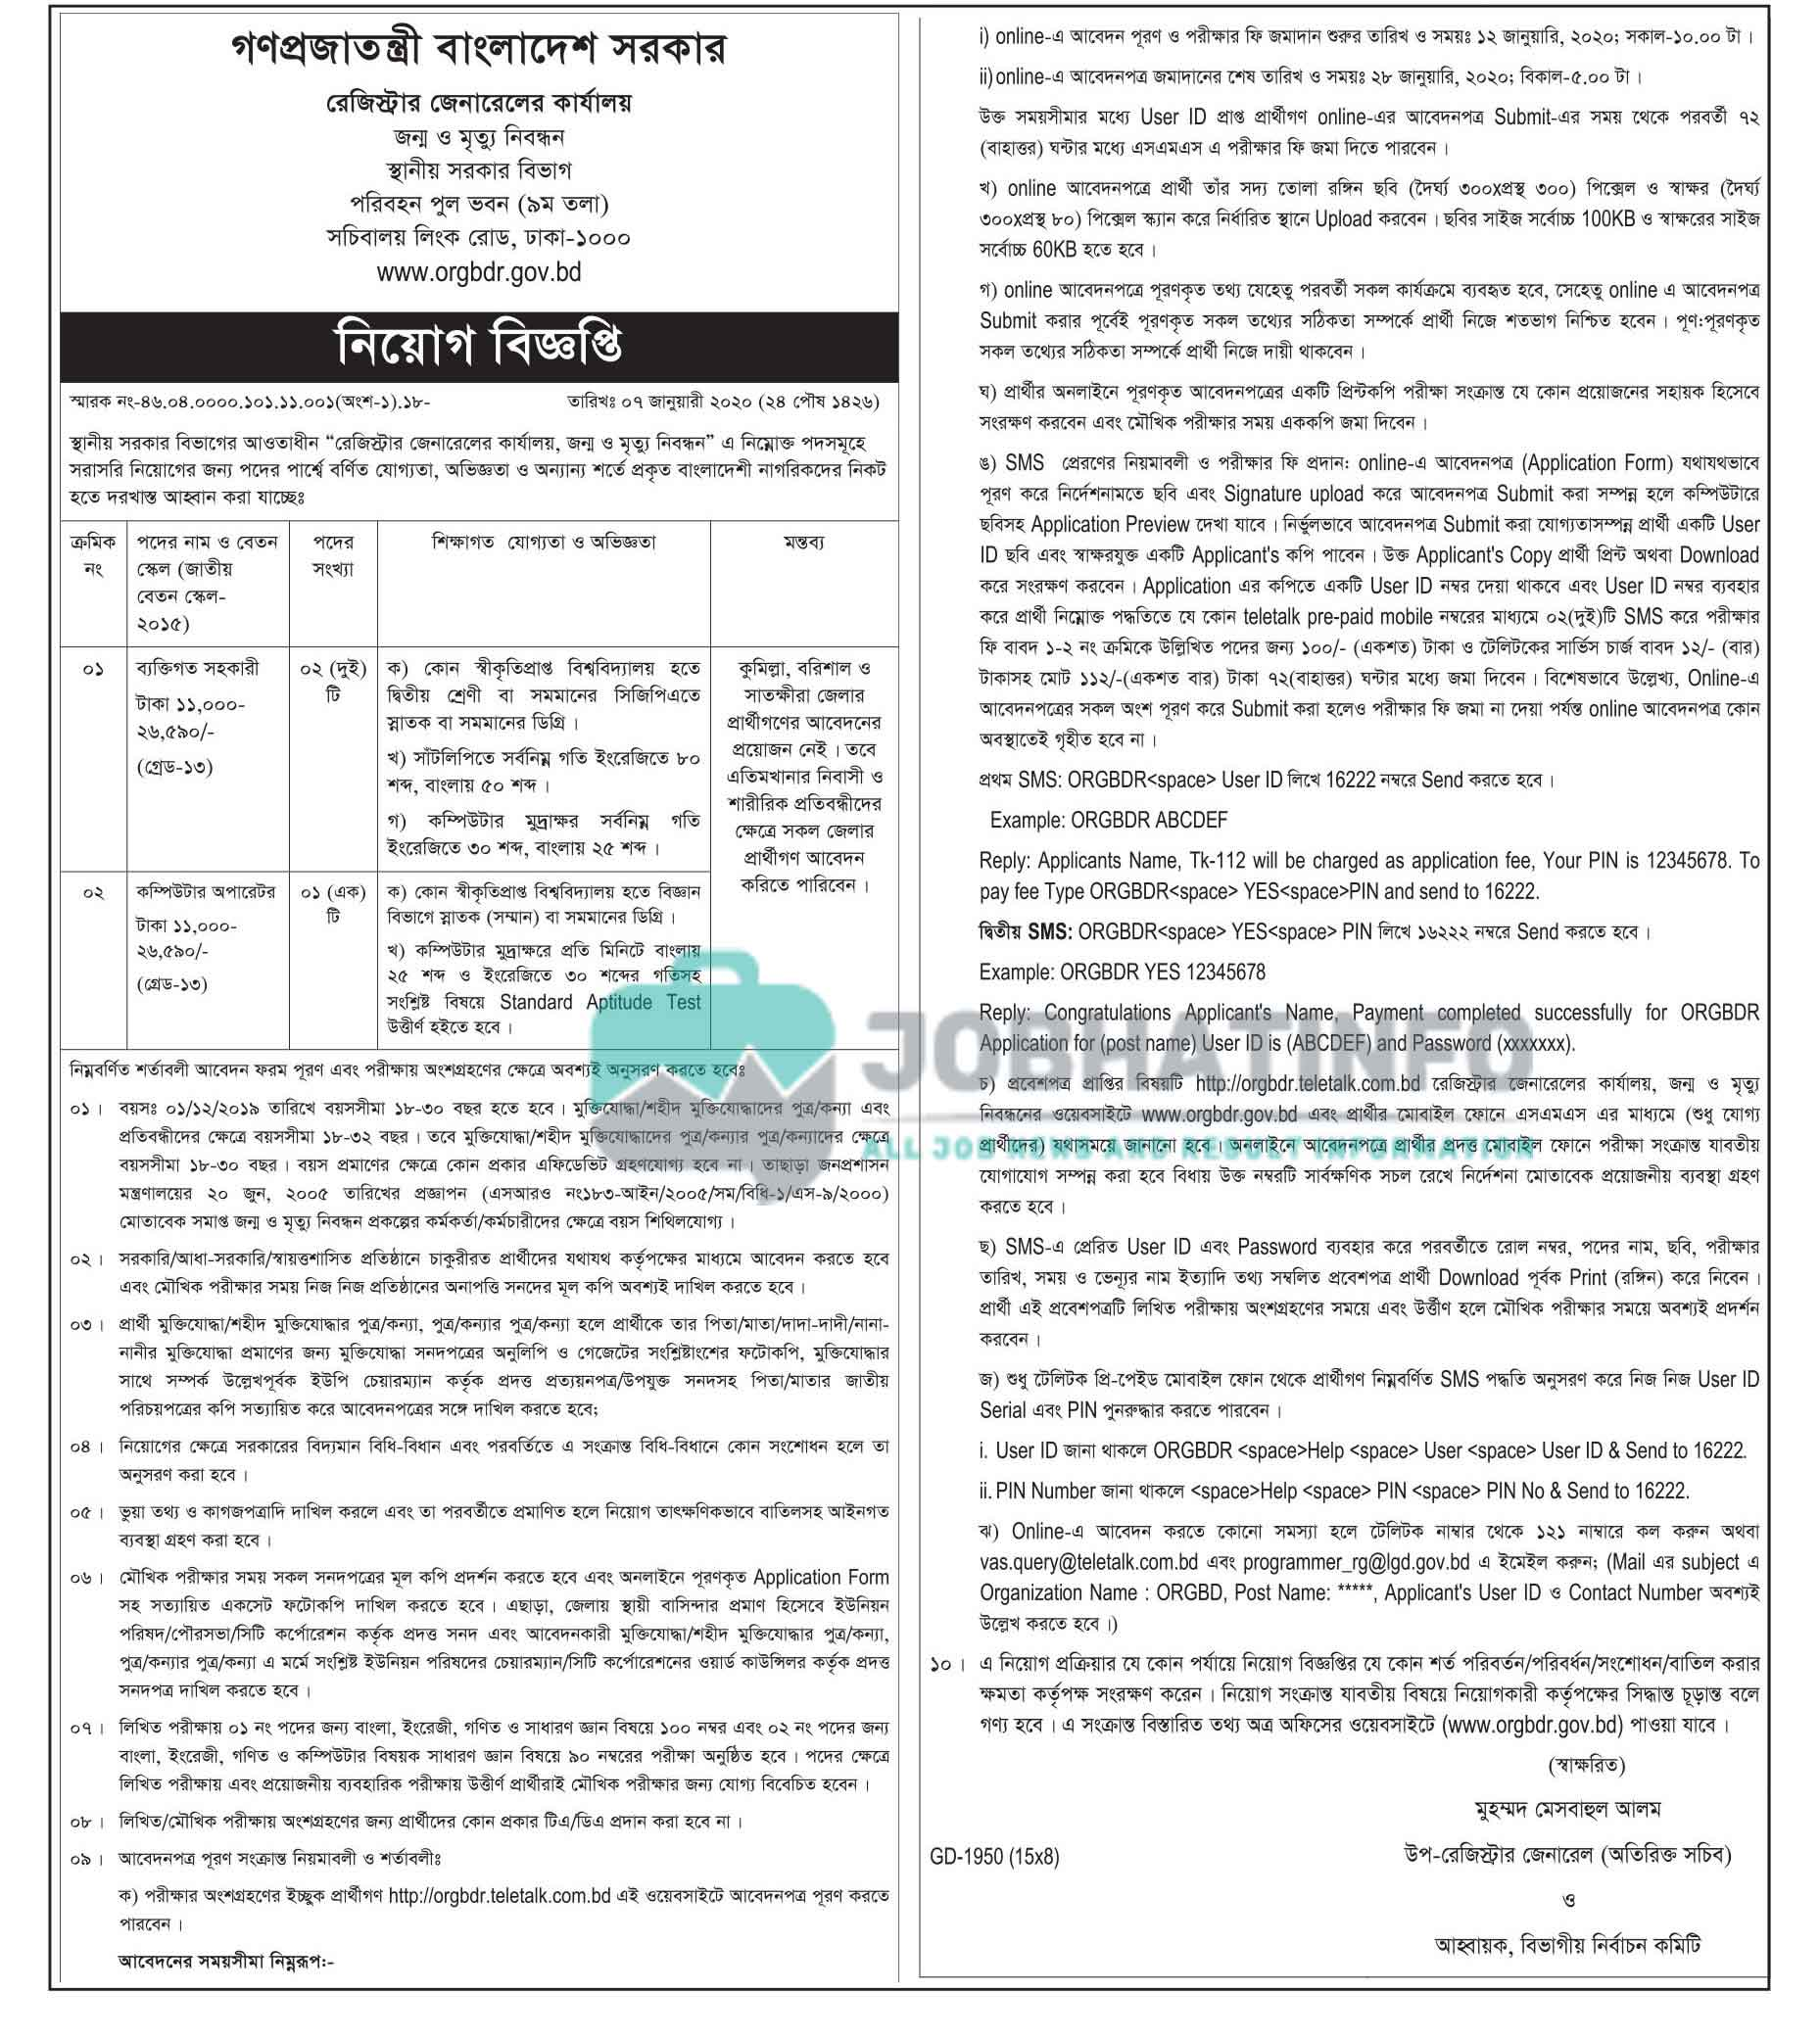 LGD Job Circular 2021 | Local Government Division | Govt Job 1